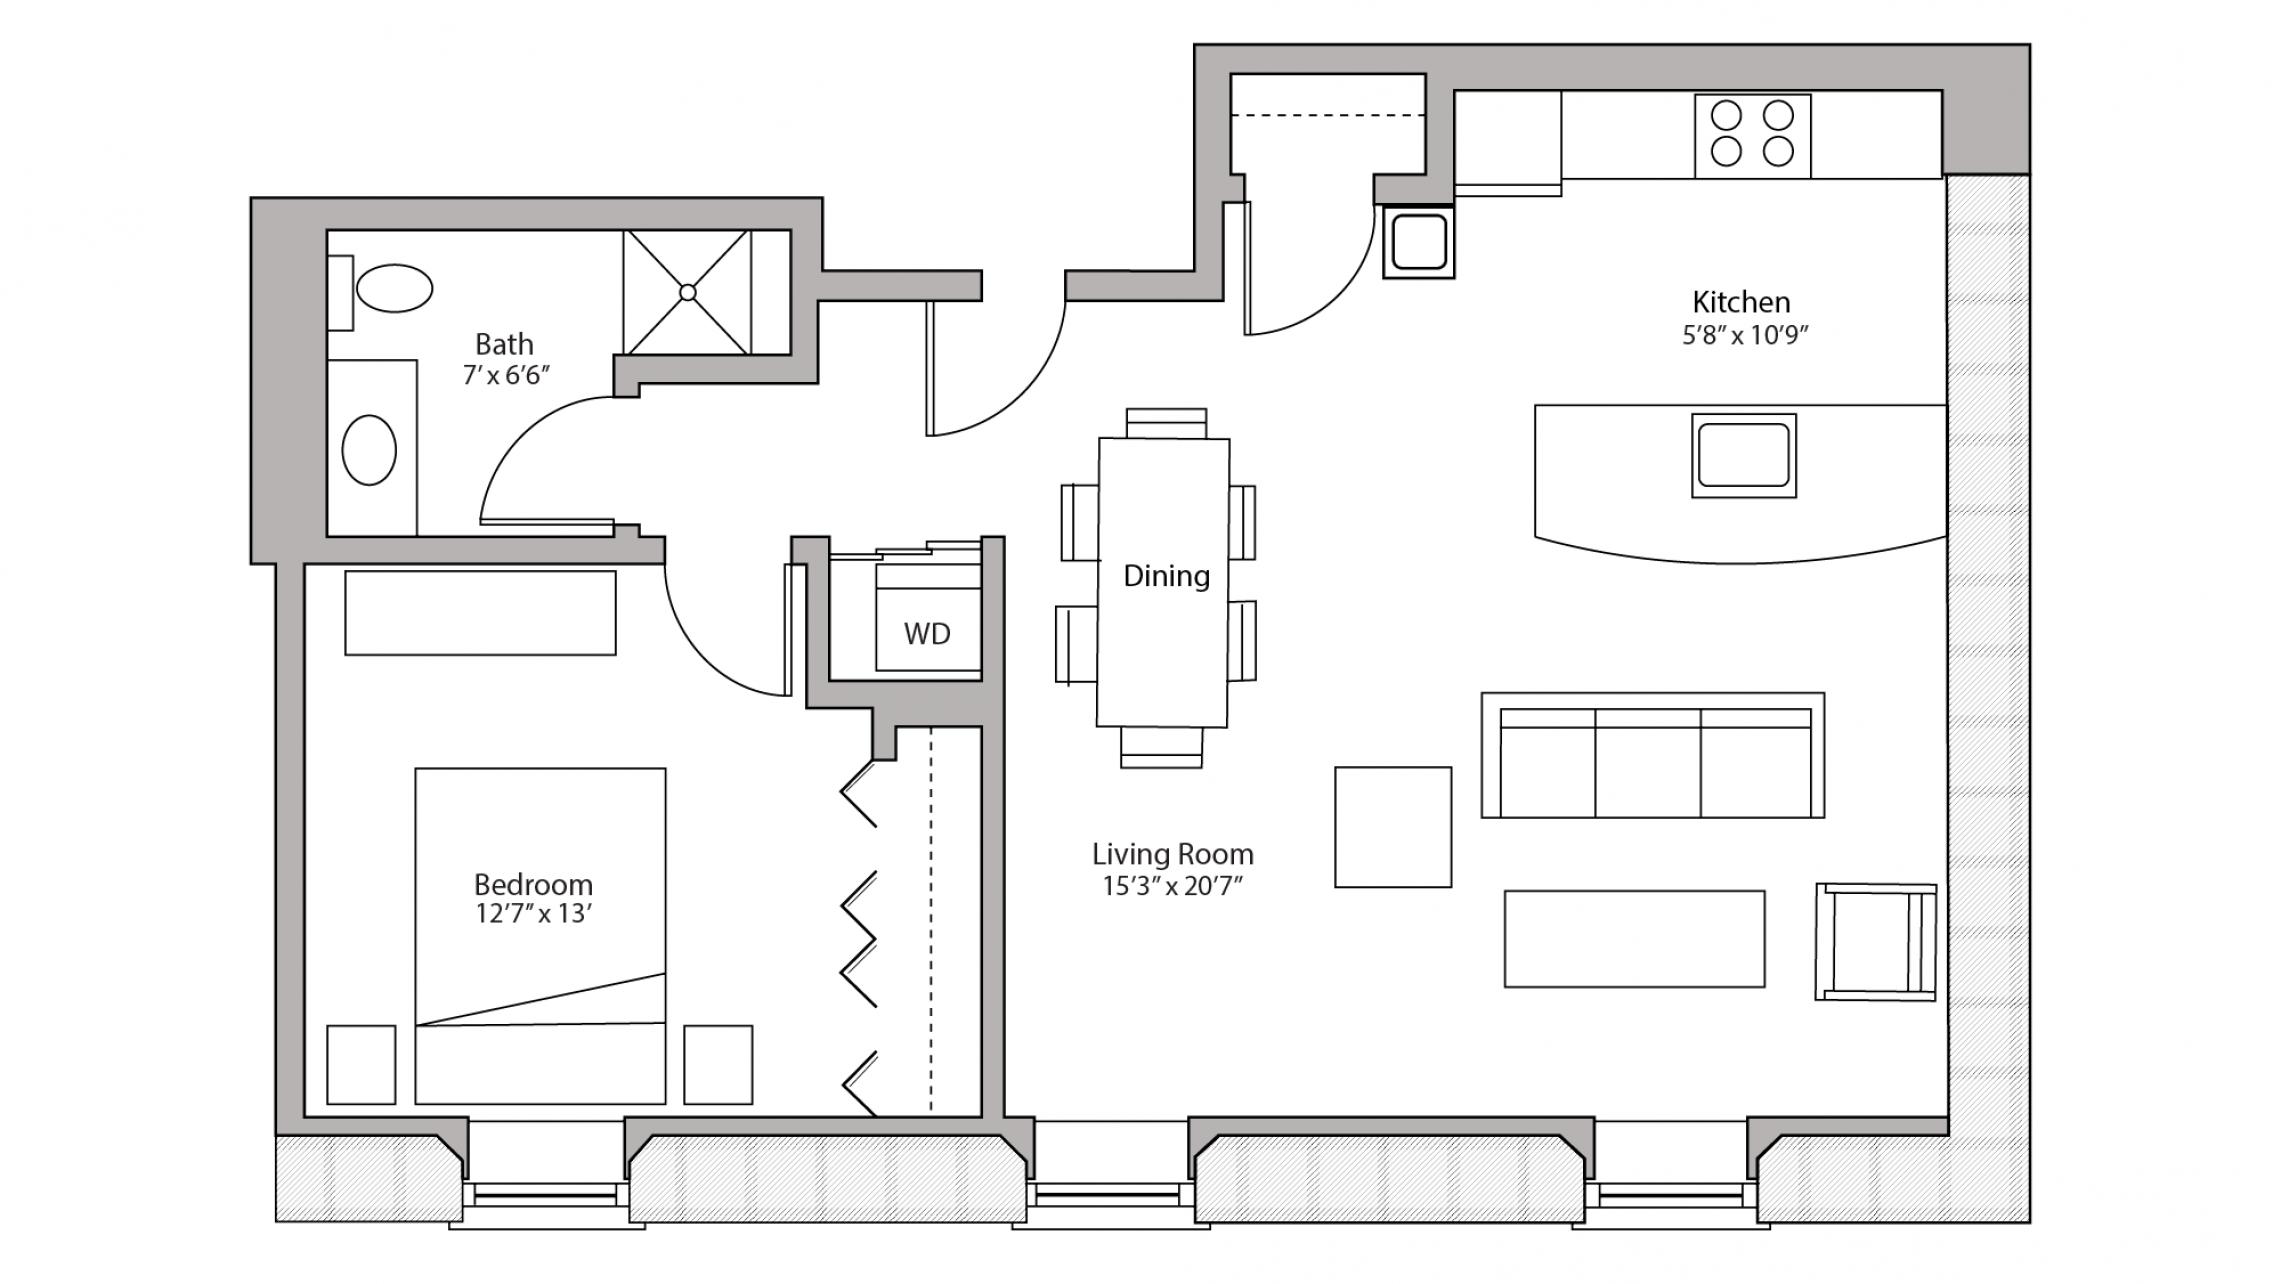 ULI Tobacco Lofts E308 - One Bedroom, One Bathroom